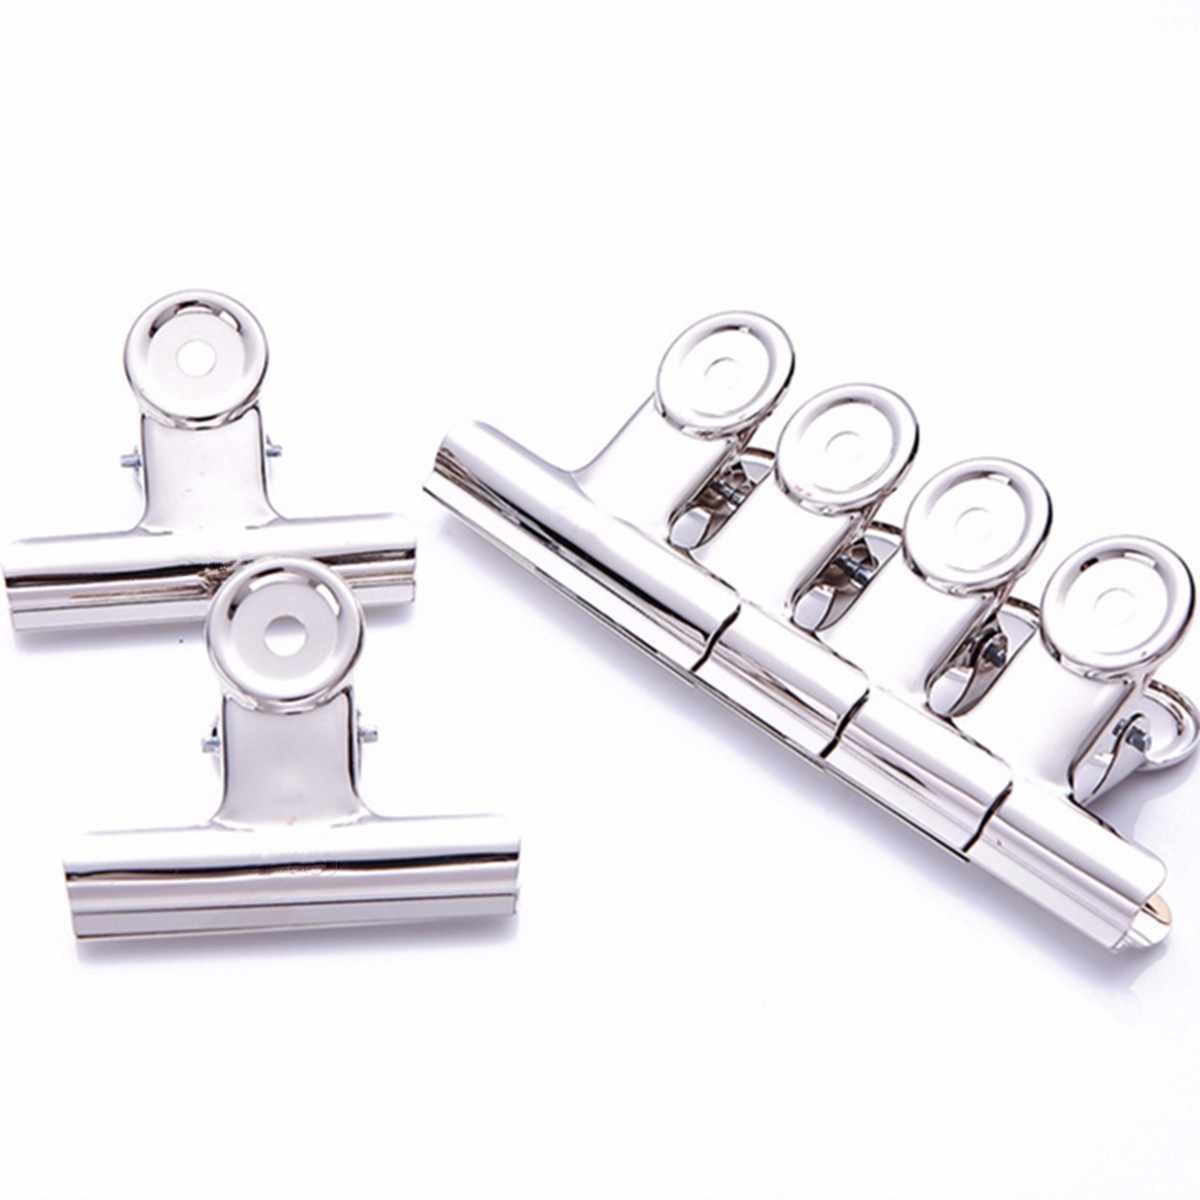 10PCS 20mm Grip Clips Bulldog Money Clip Letter Binder Paper Metal Clamp CL G1W4